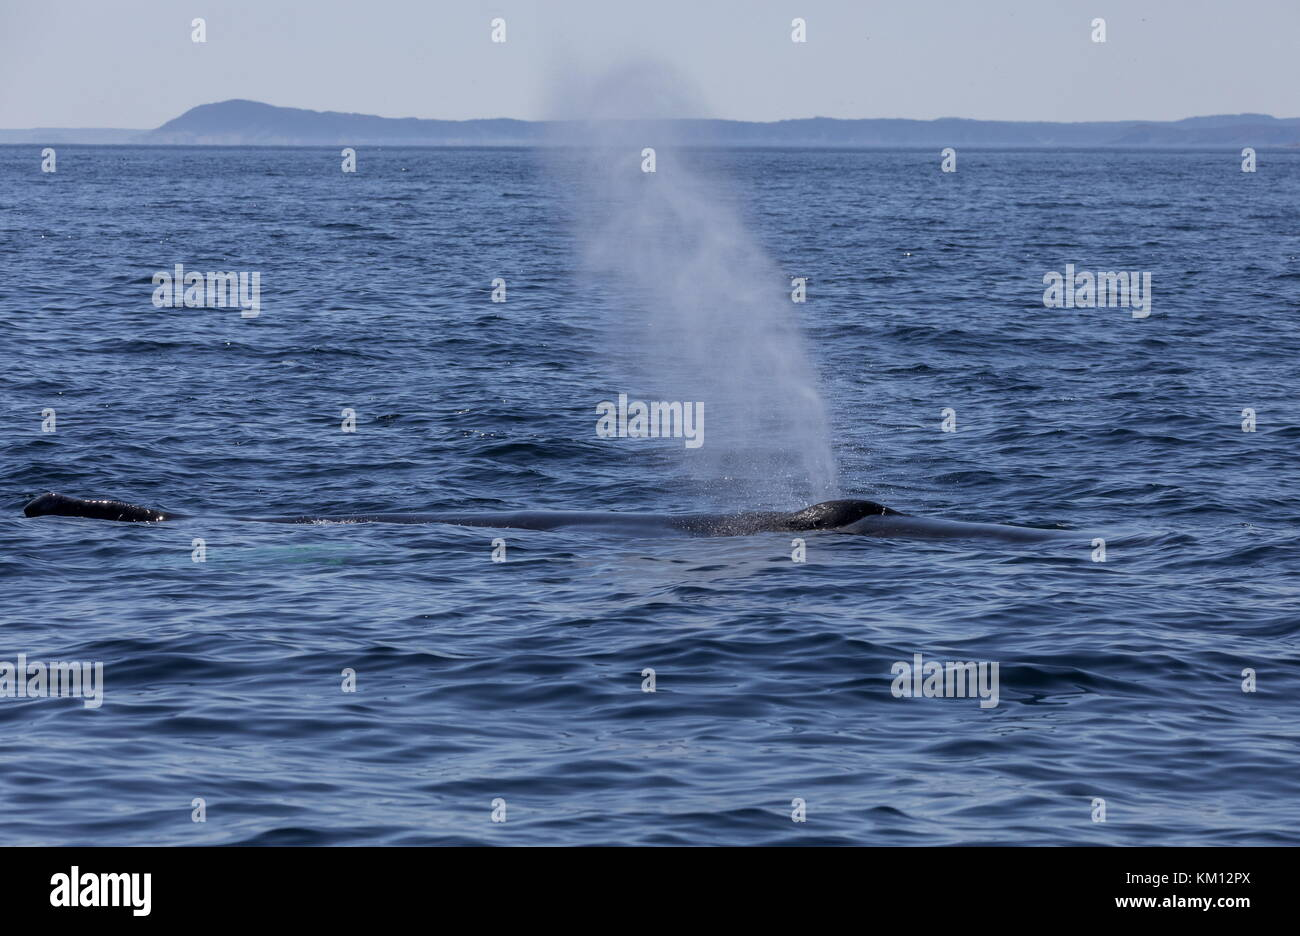 Humpback whale, Megaptera novaeangliae, surfacing to breathe. Stock Photo